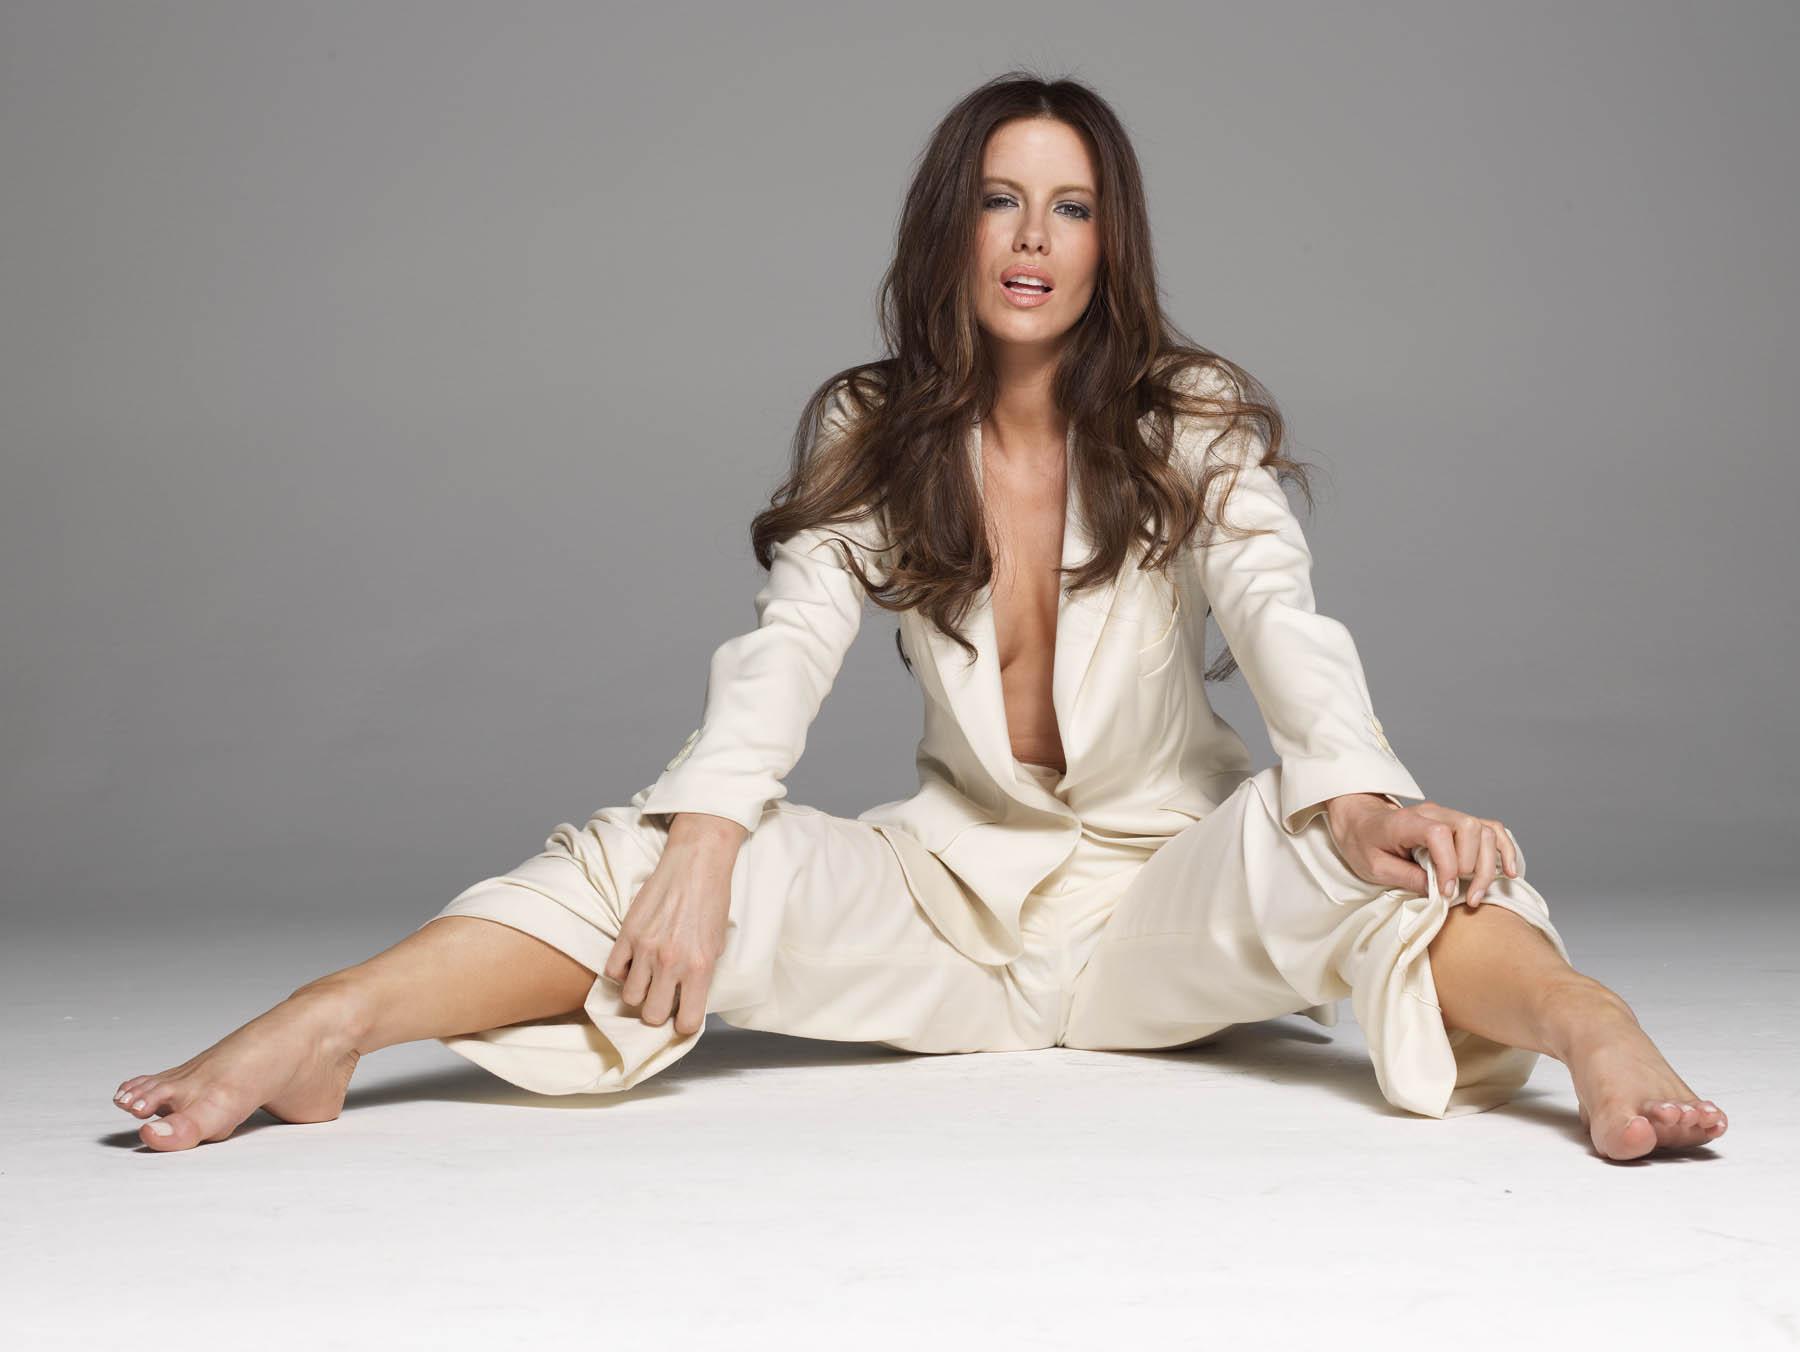 Kate Beckinsale desnuda en Hechizados 1995 La